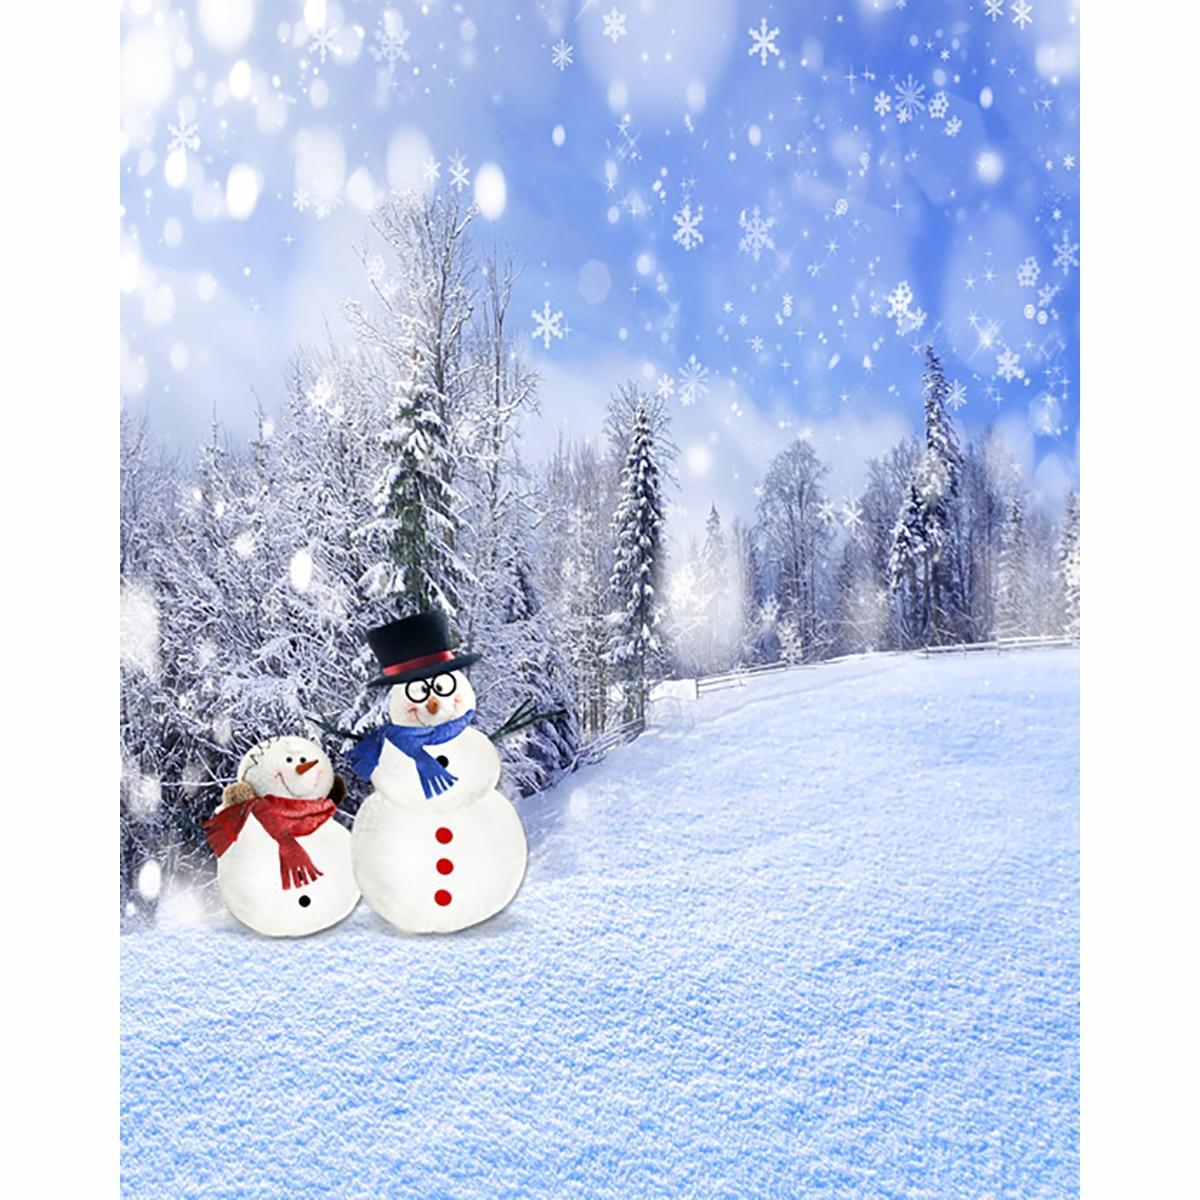 New Christmas backgrounds for christmas photo studio Snowman snow ...